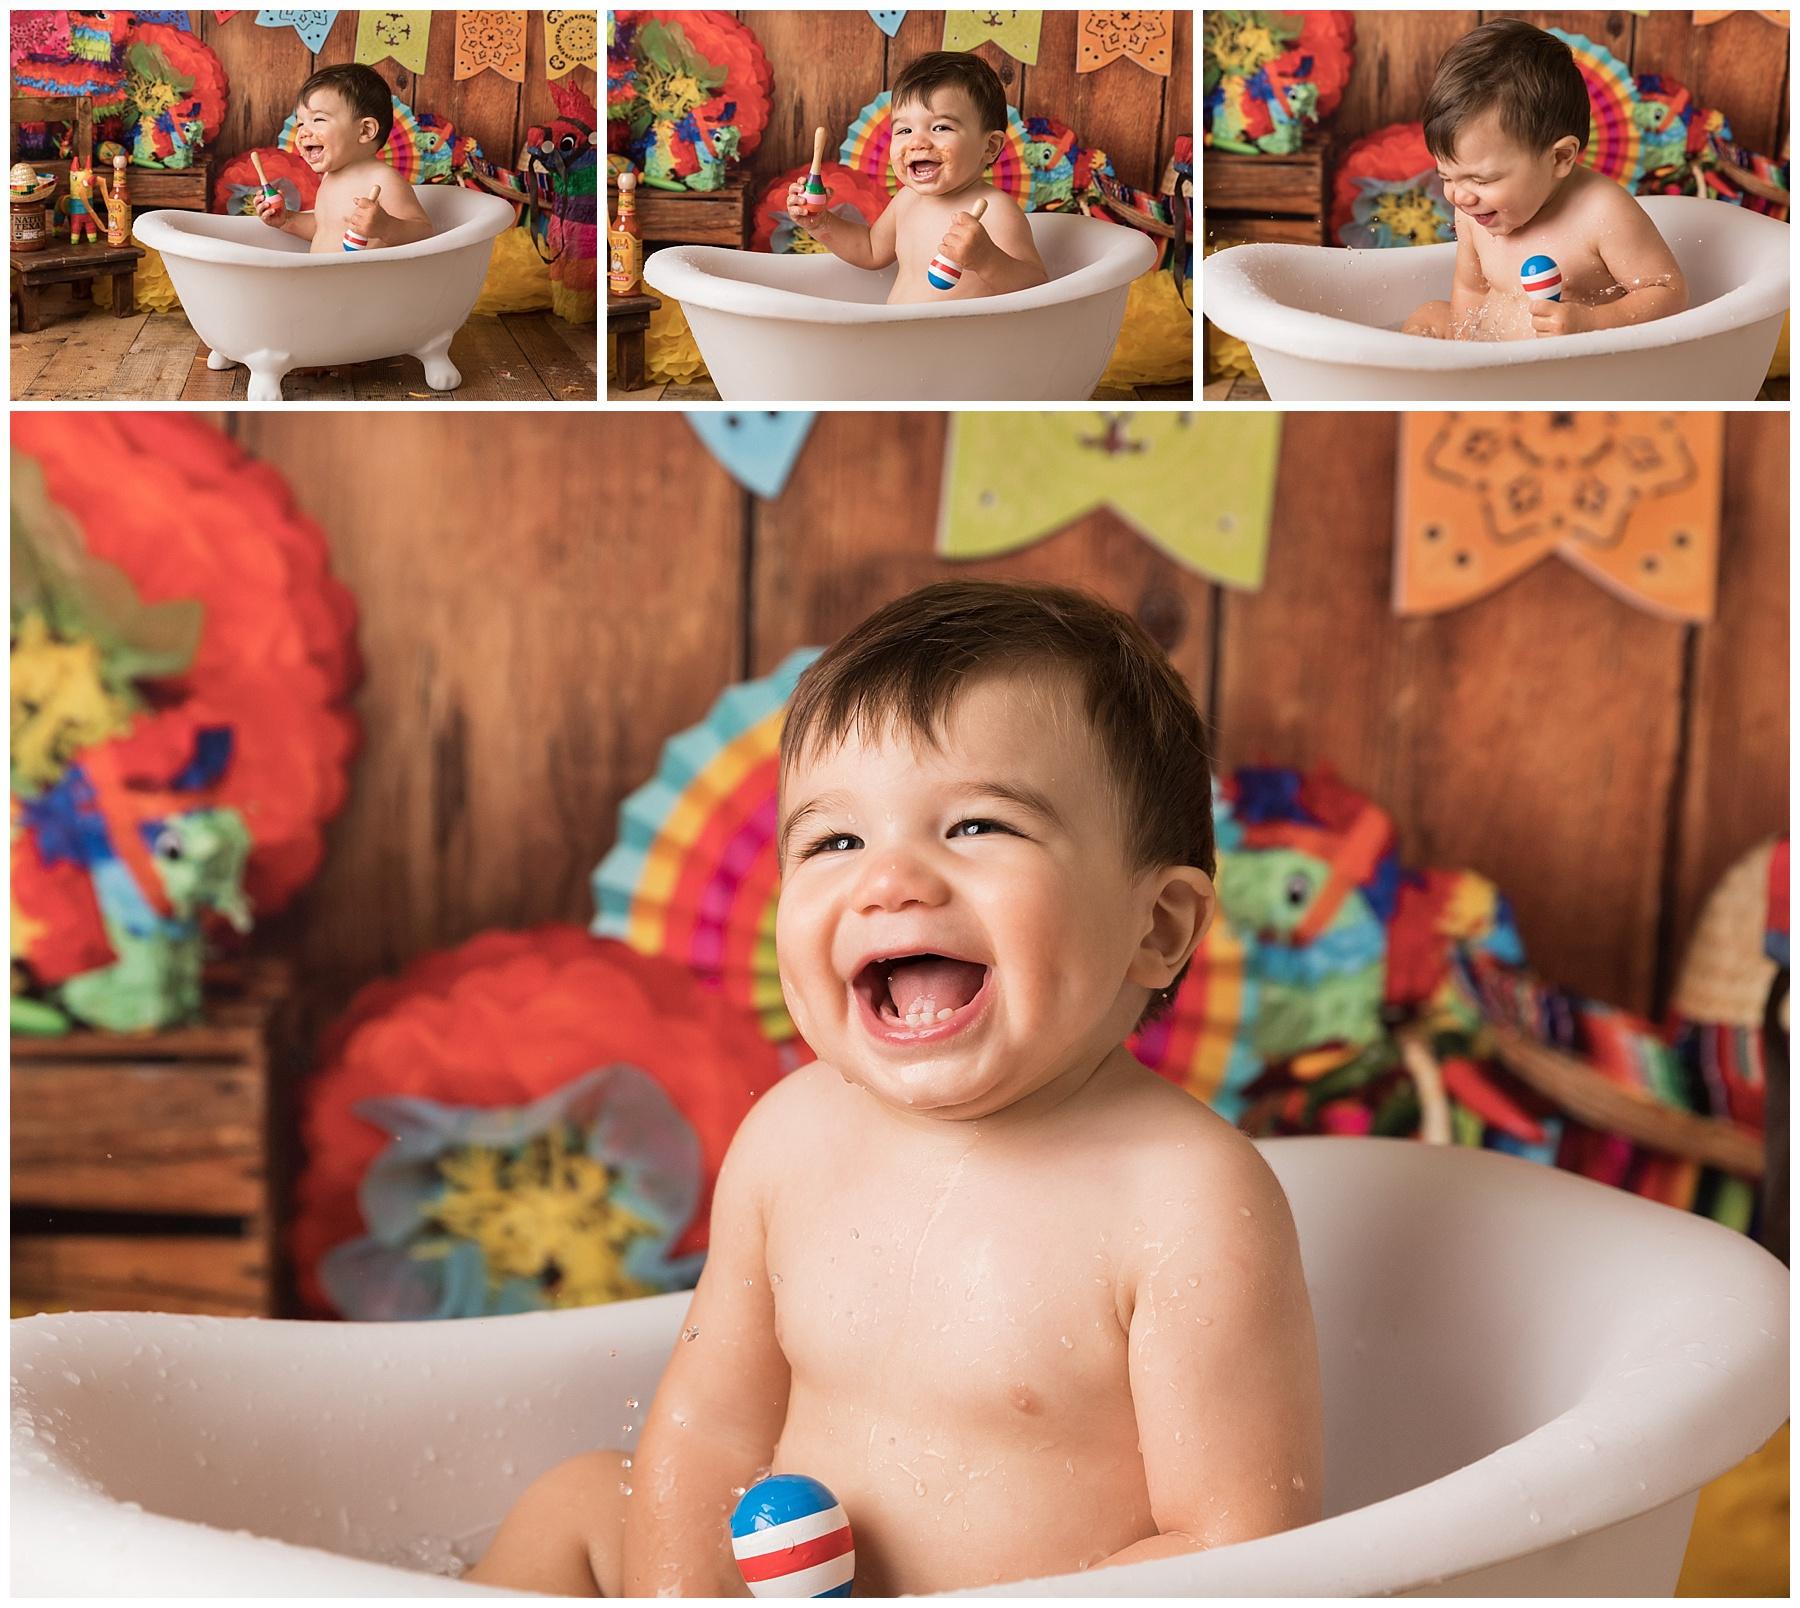 austin texas baby taco smash bath splash